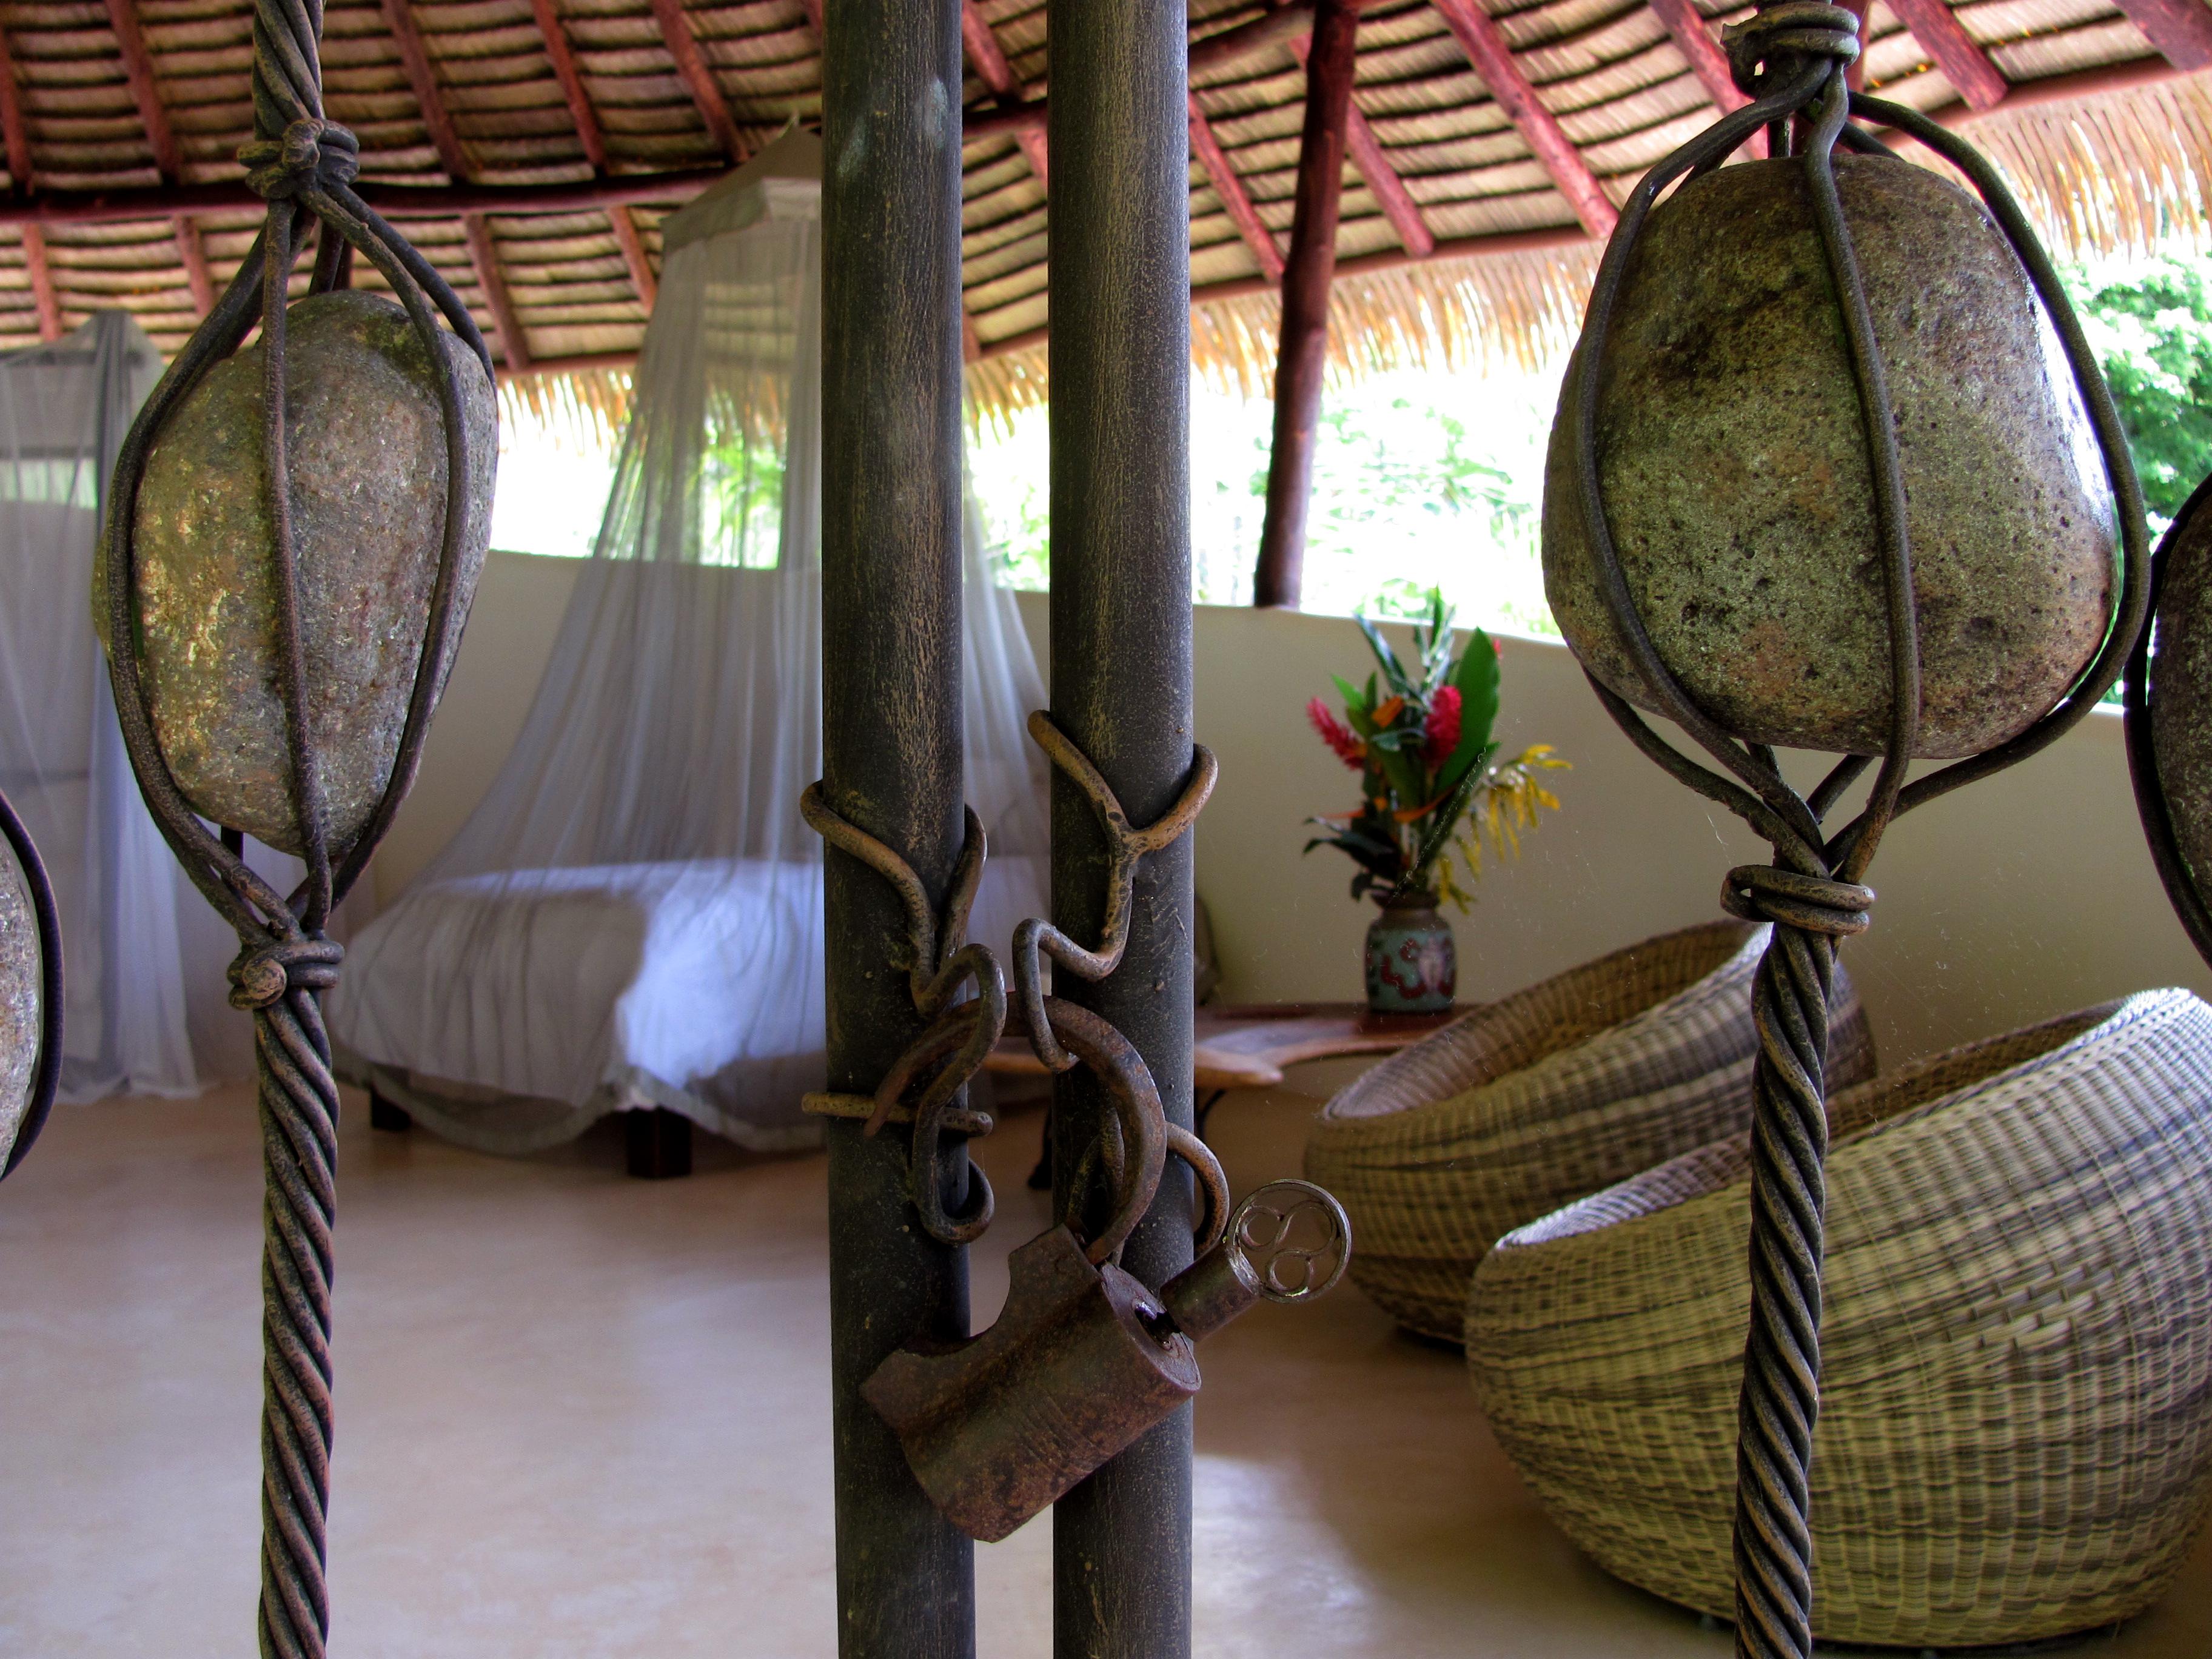 cabinas-inside2.jpg